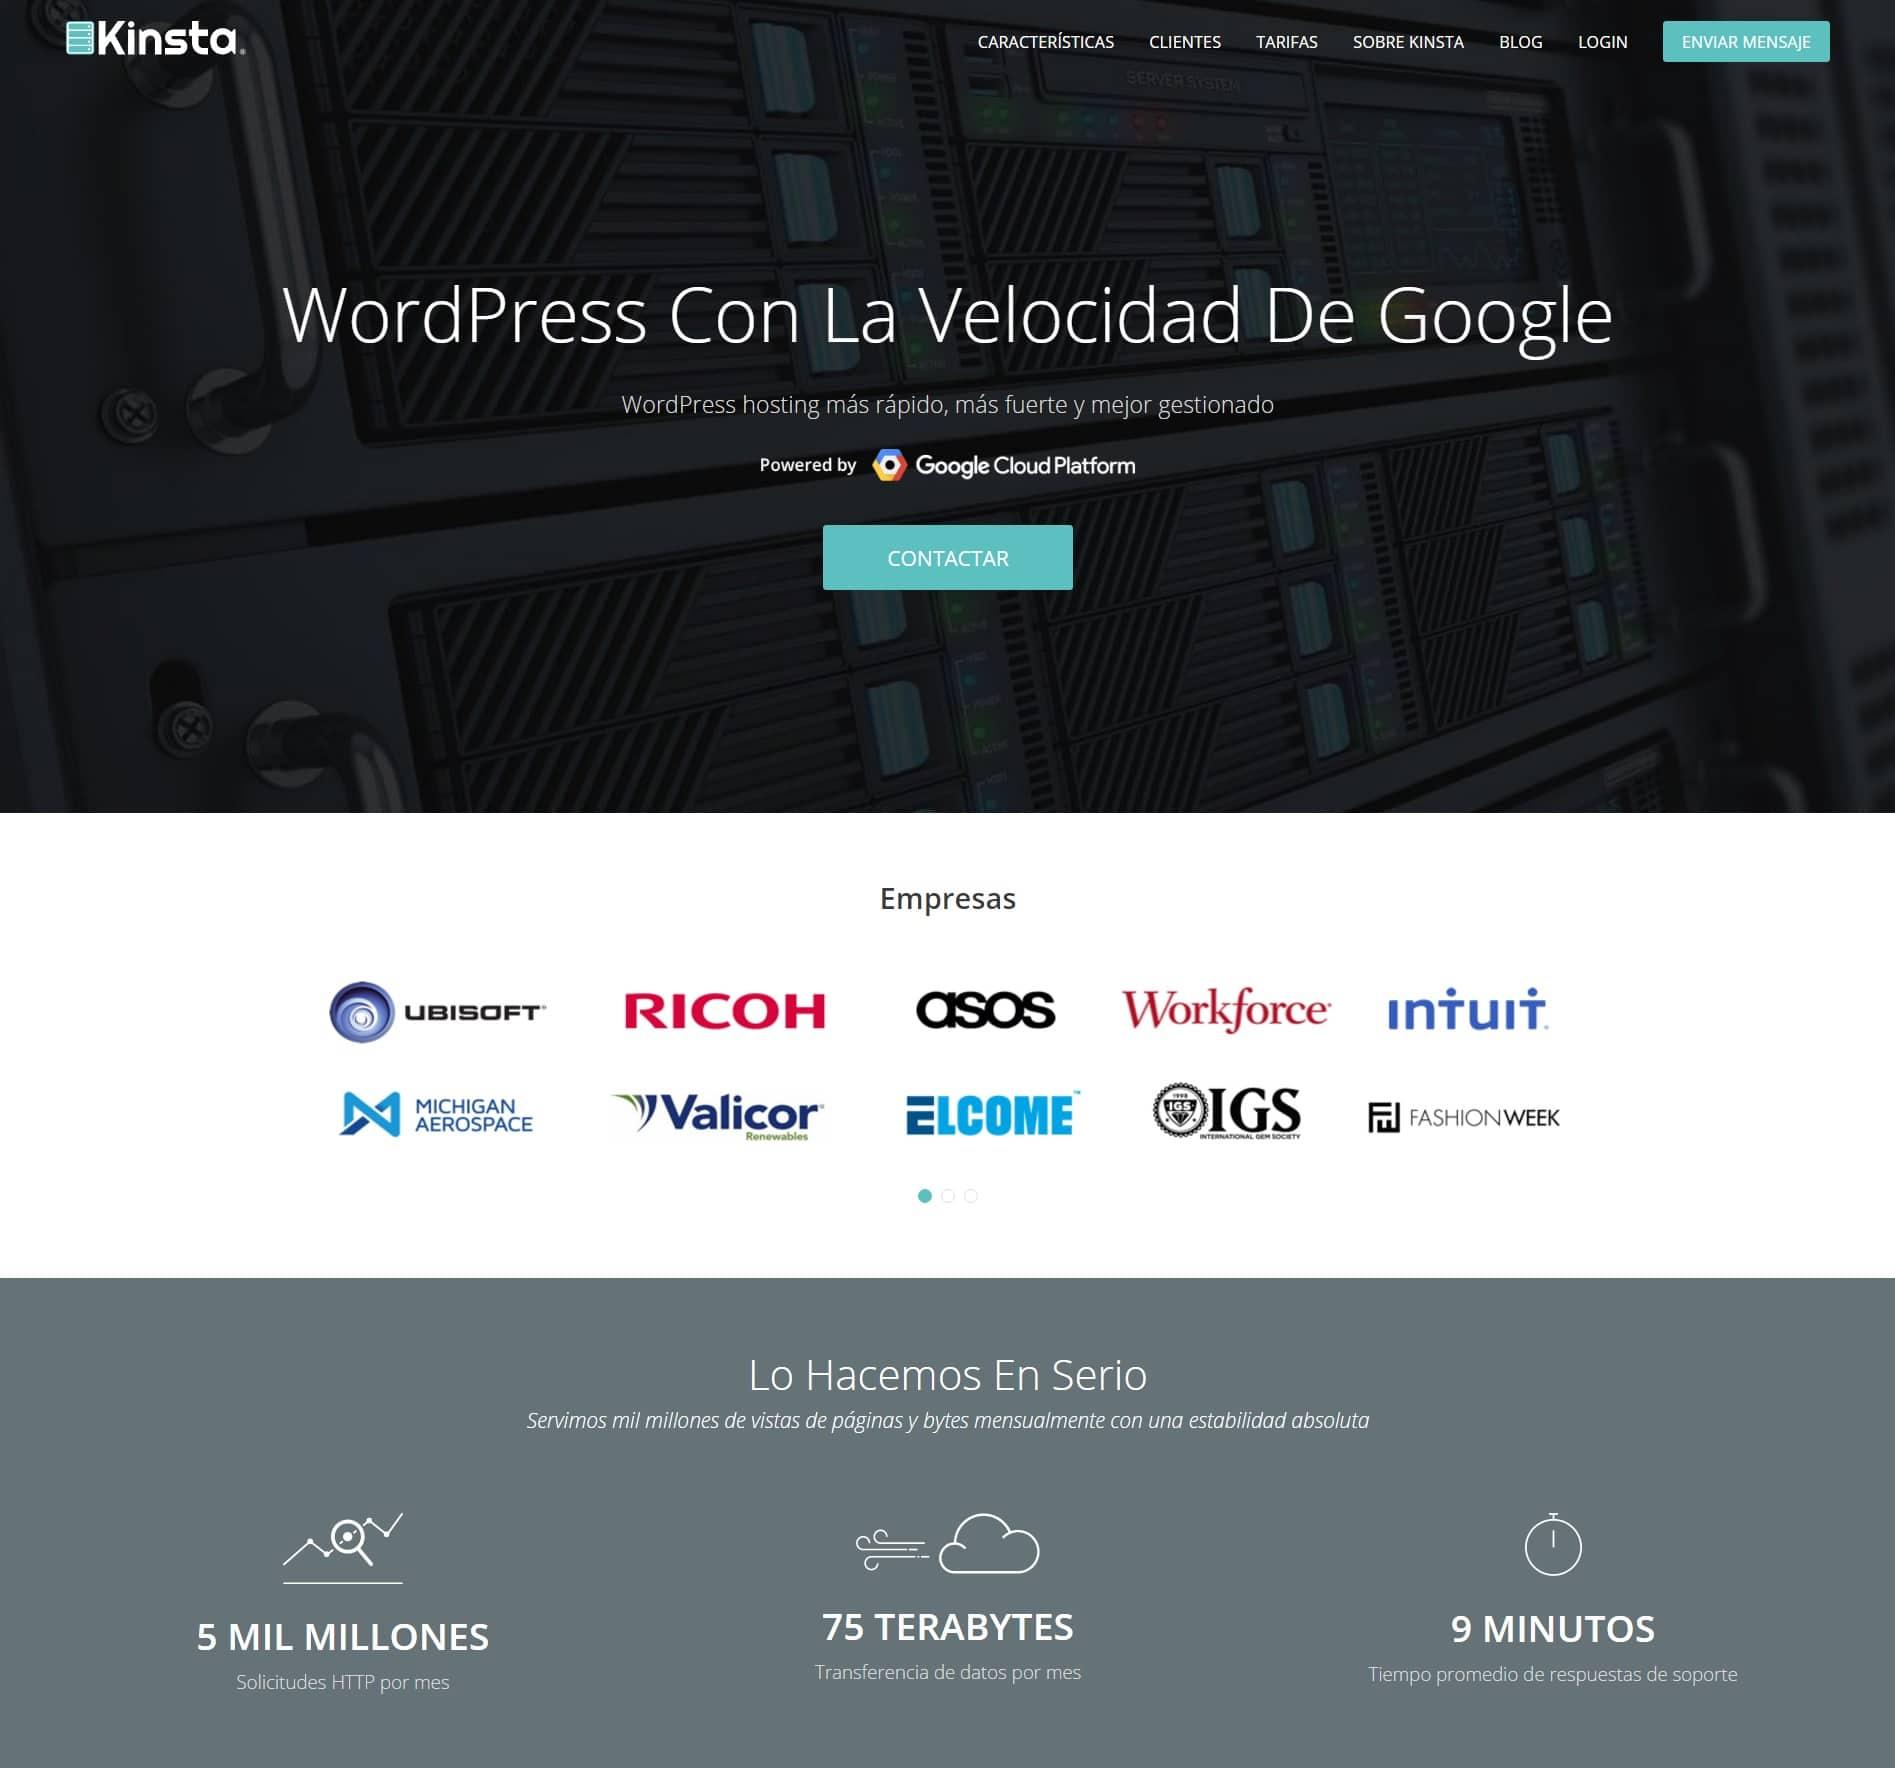 Kinsta-Spanish-site